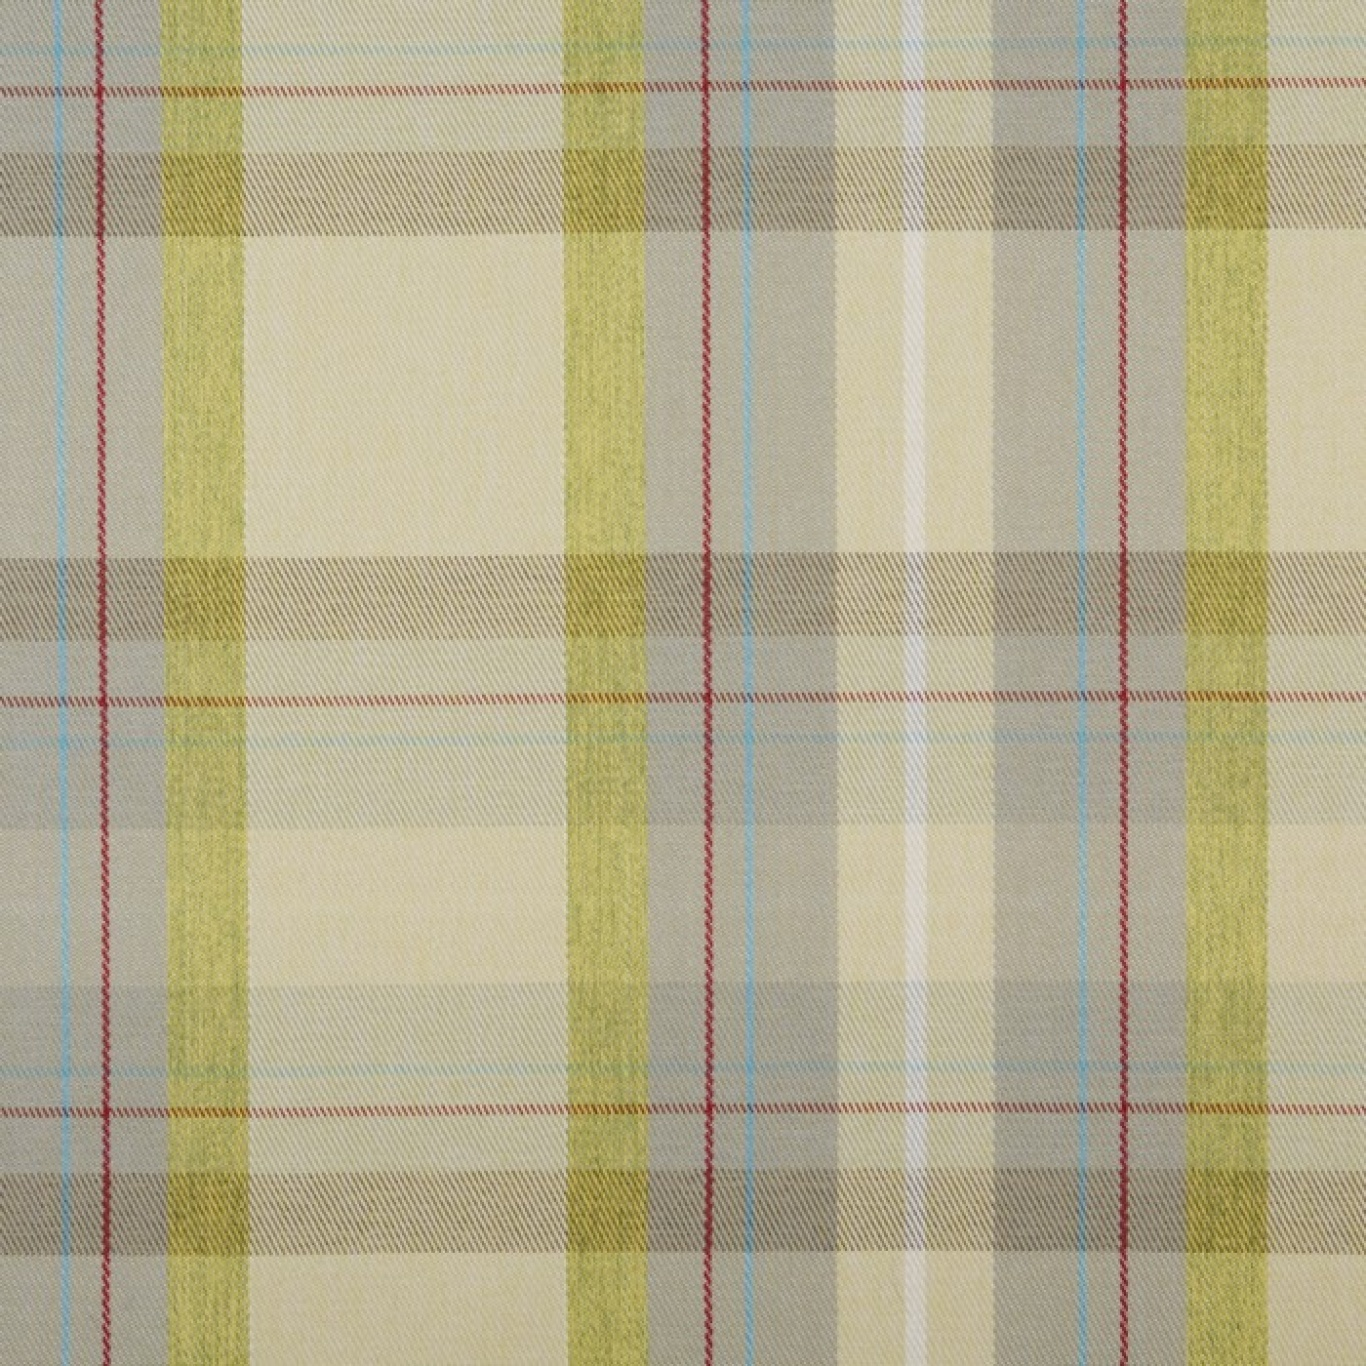 Image of Prestigious Cairngorm Moss Fabric